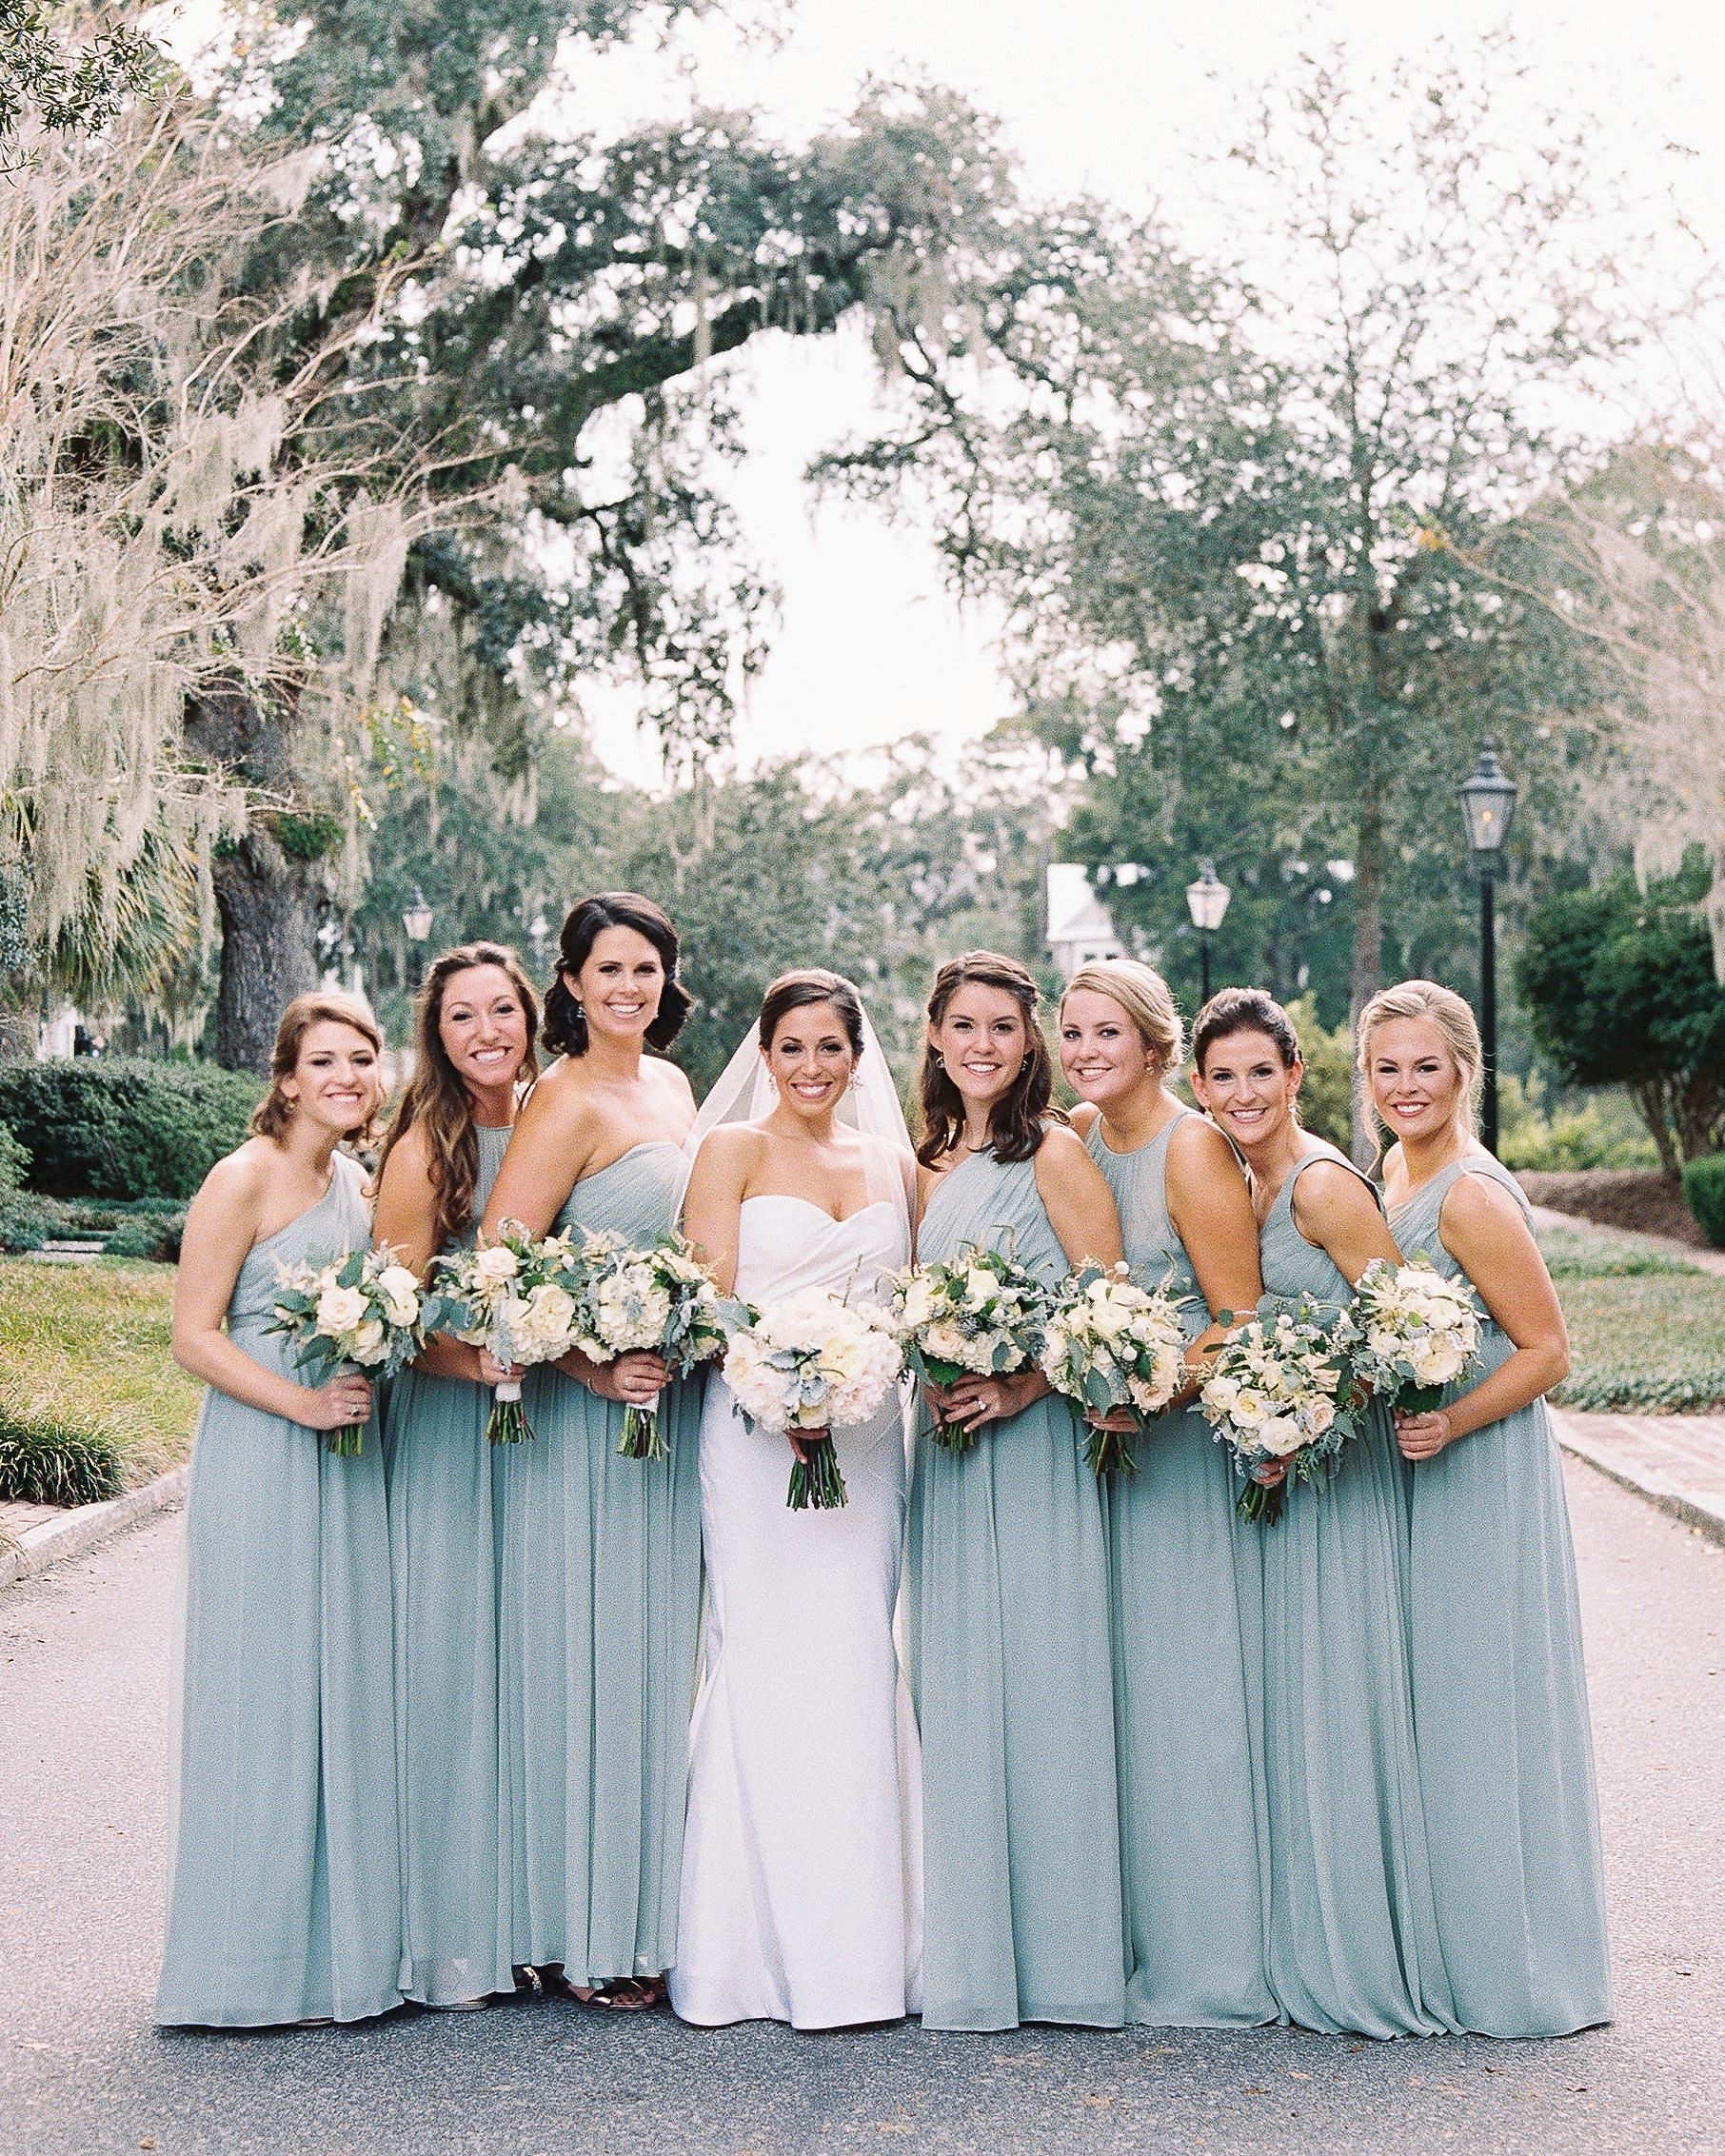 taylor-john-wedding-bridesmaids-32-s113035-0616.jpg